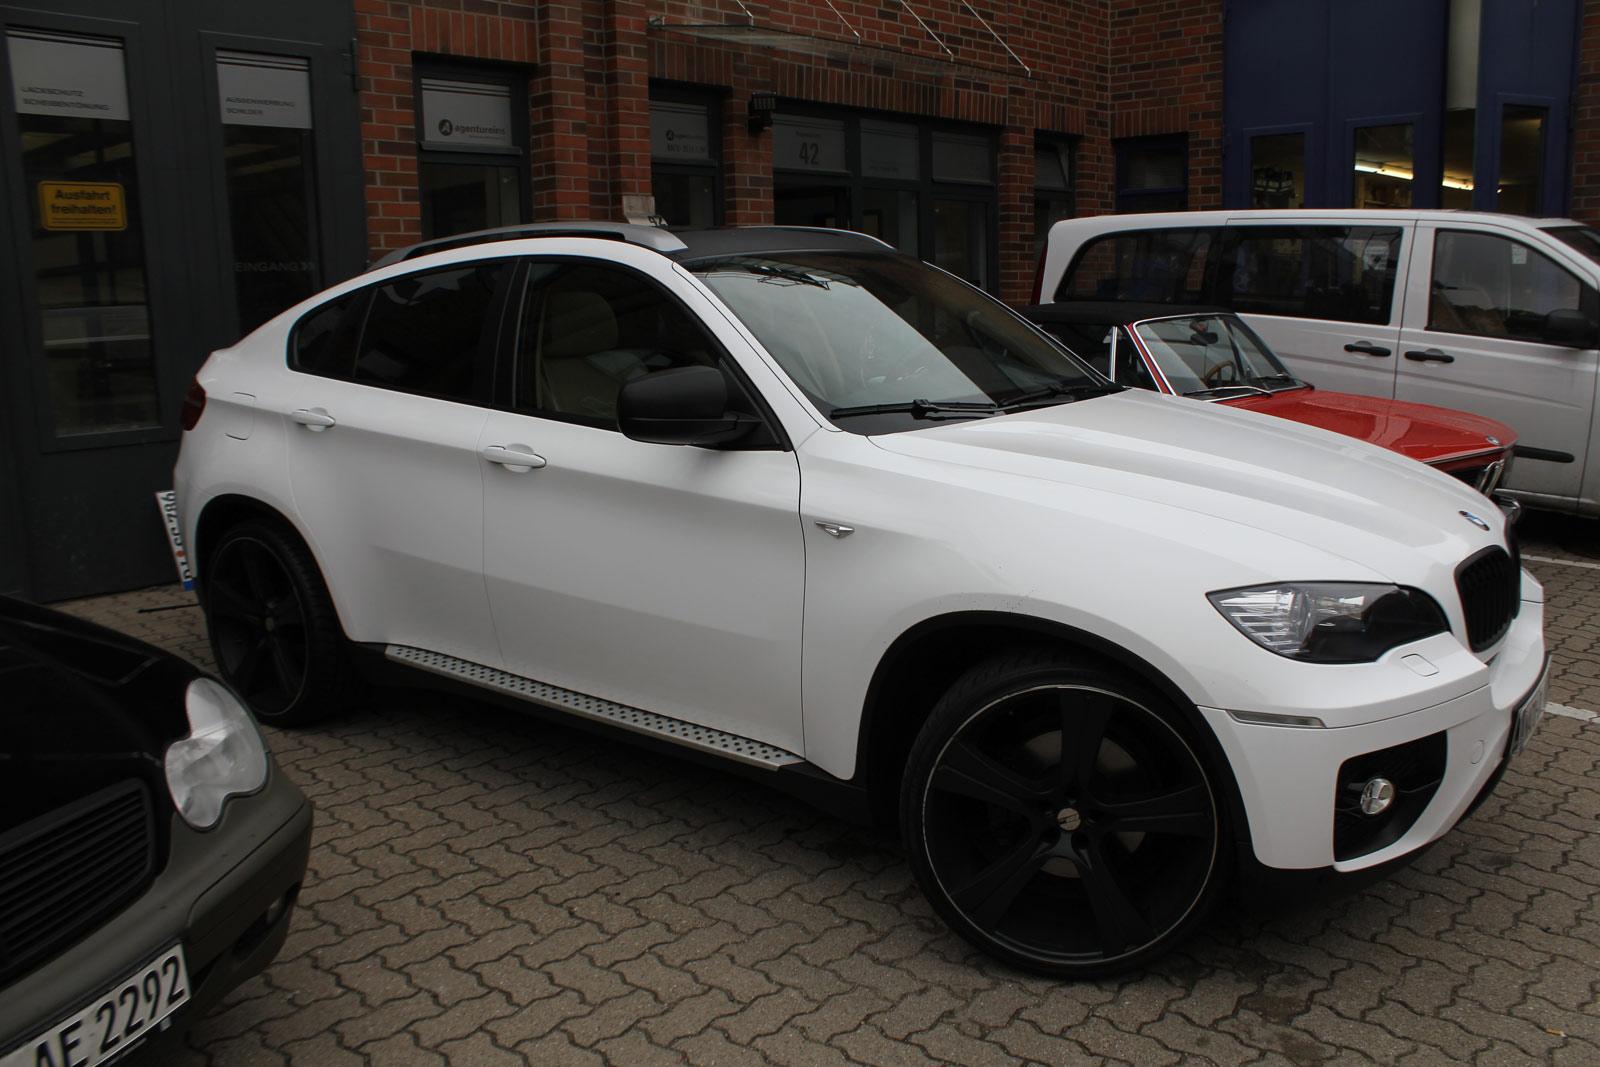 BMW_X6_FOLIERUNG_WEISS_GLANZ_PLUS_CARBON_13